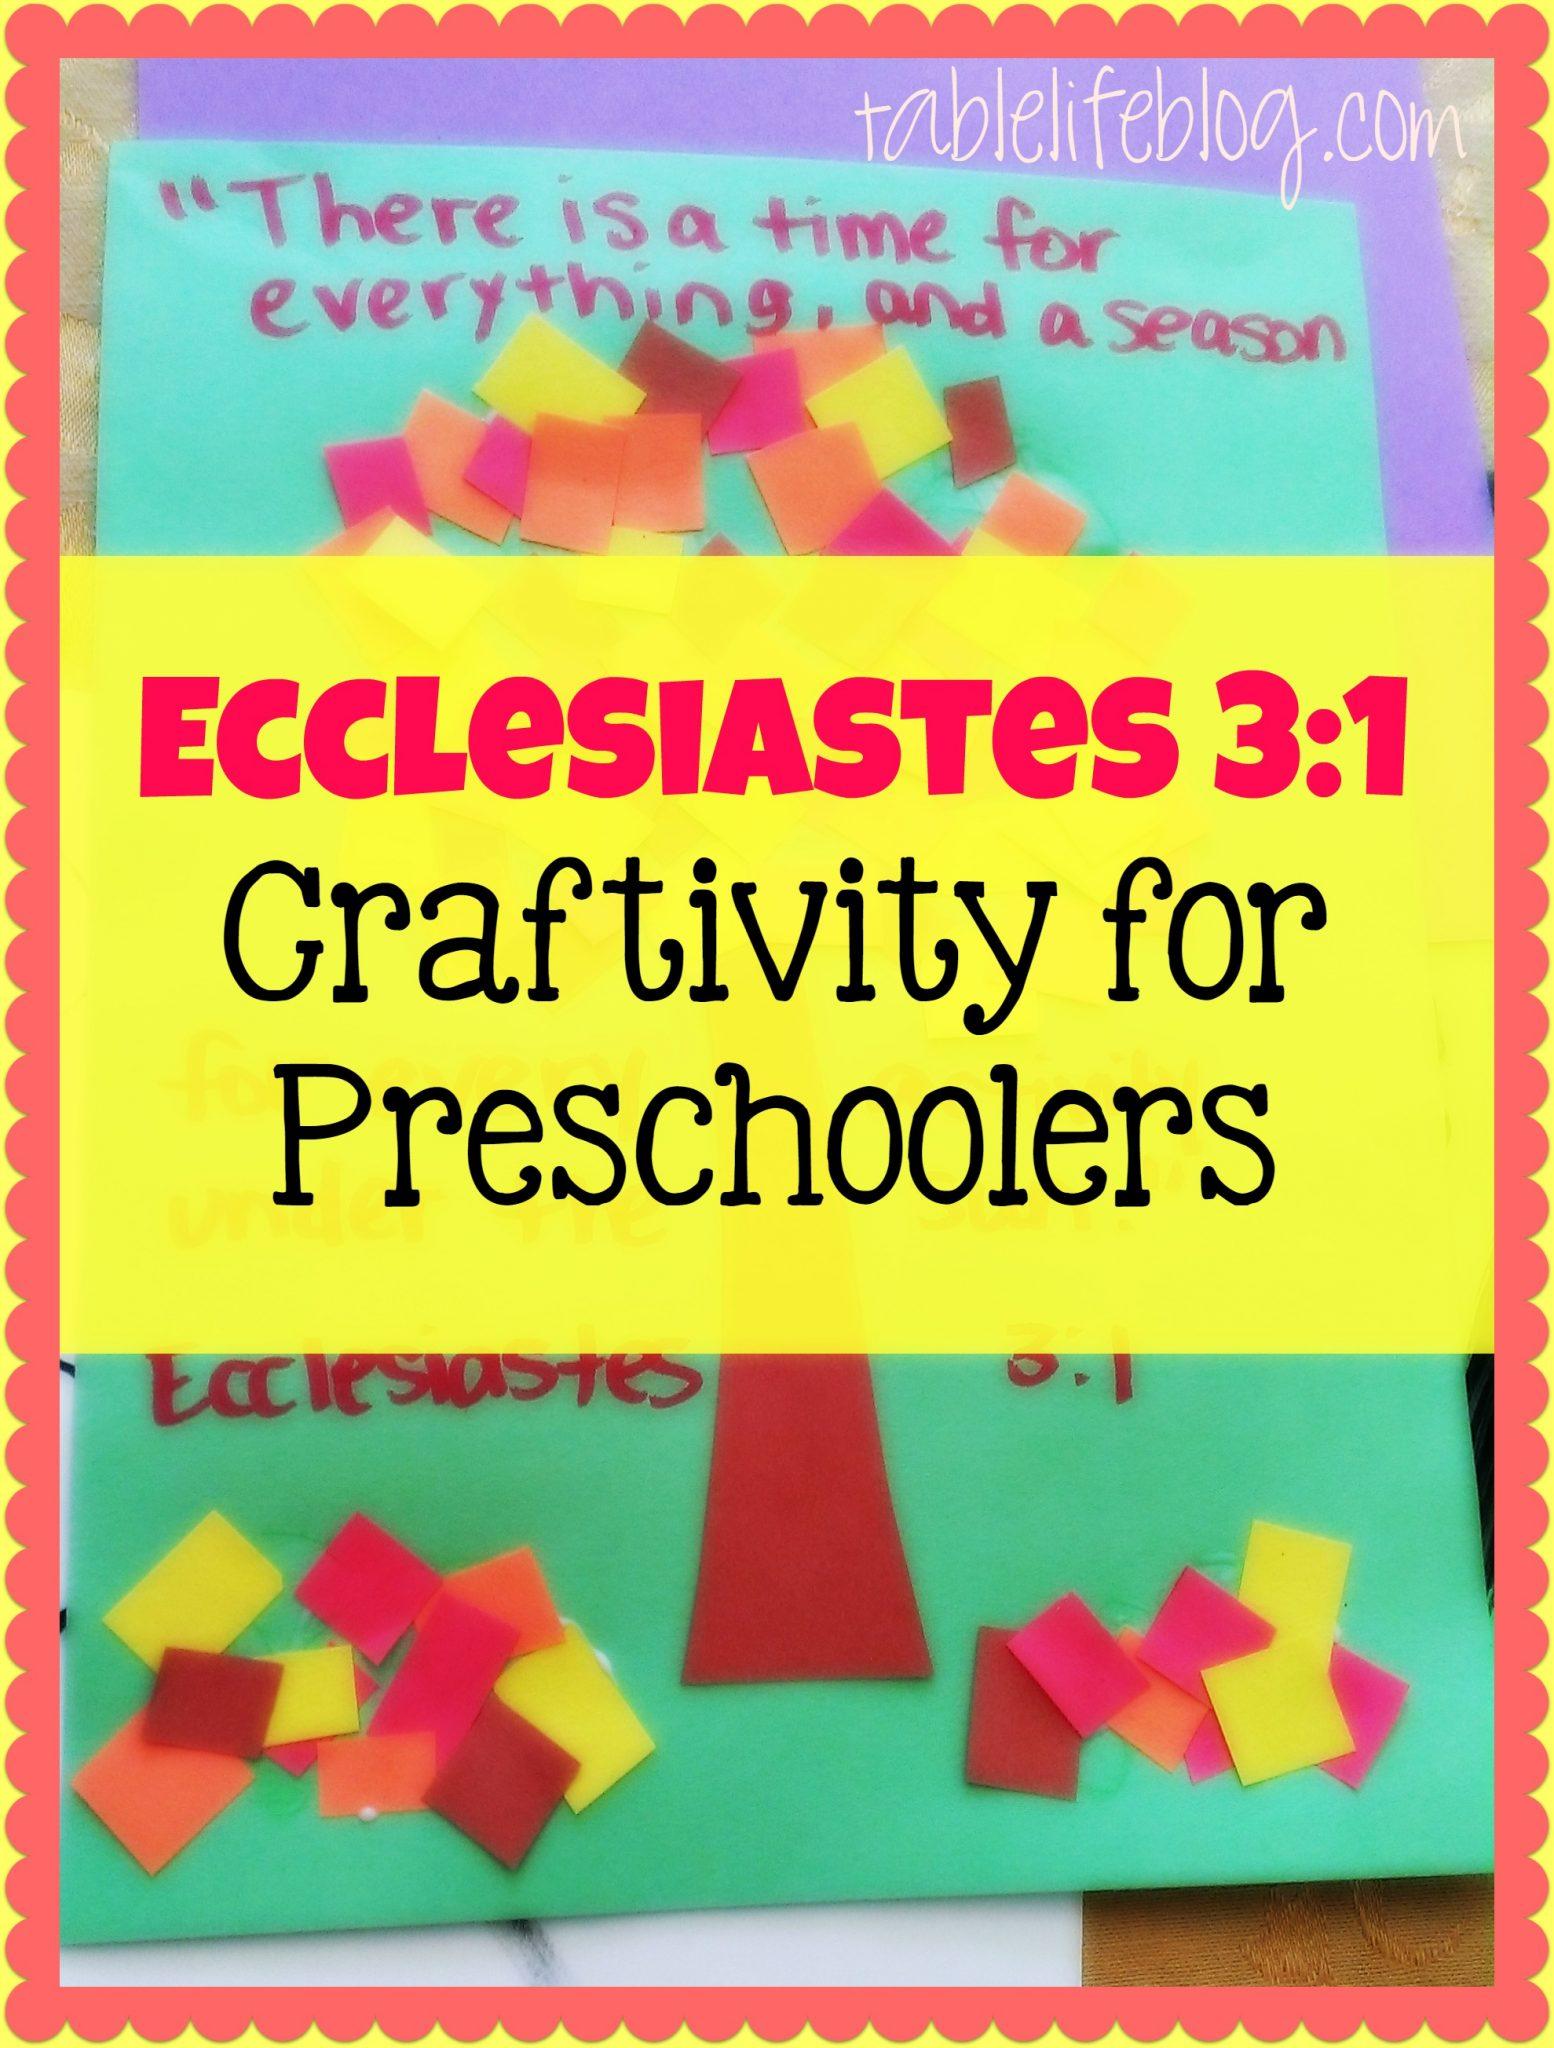 Ecclesiastes 3:1 Craftivity for Preschoolers